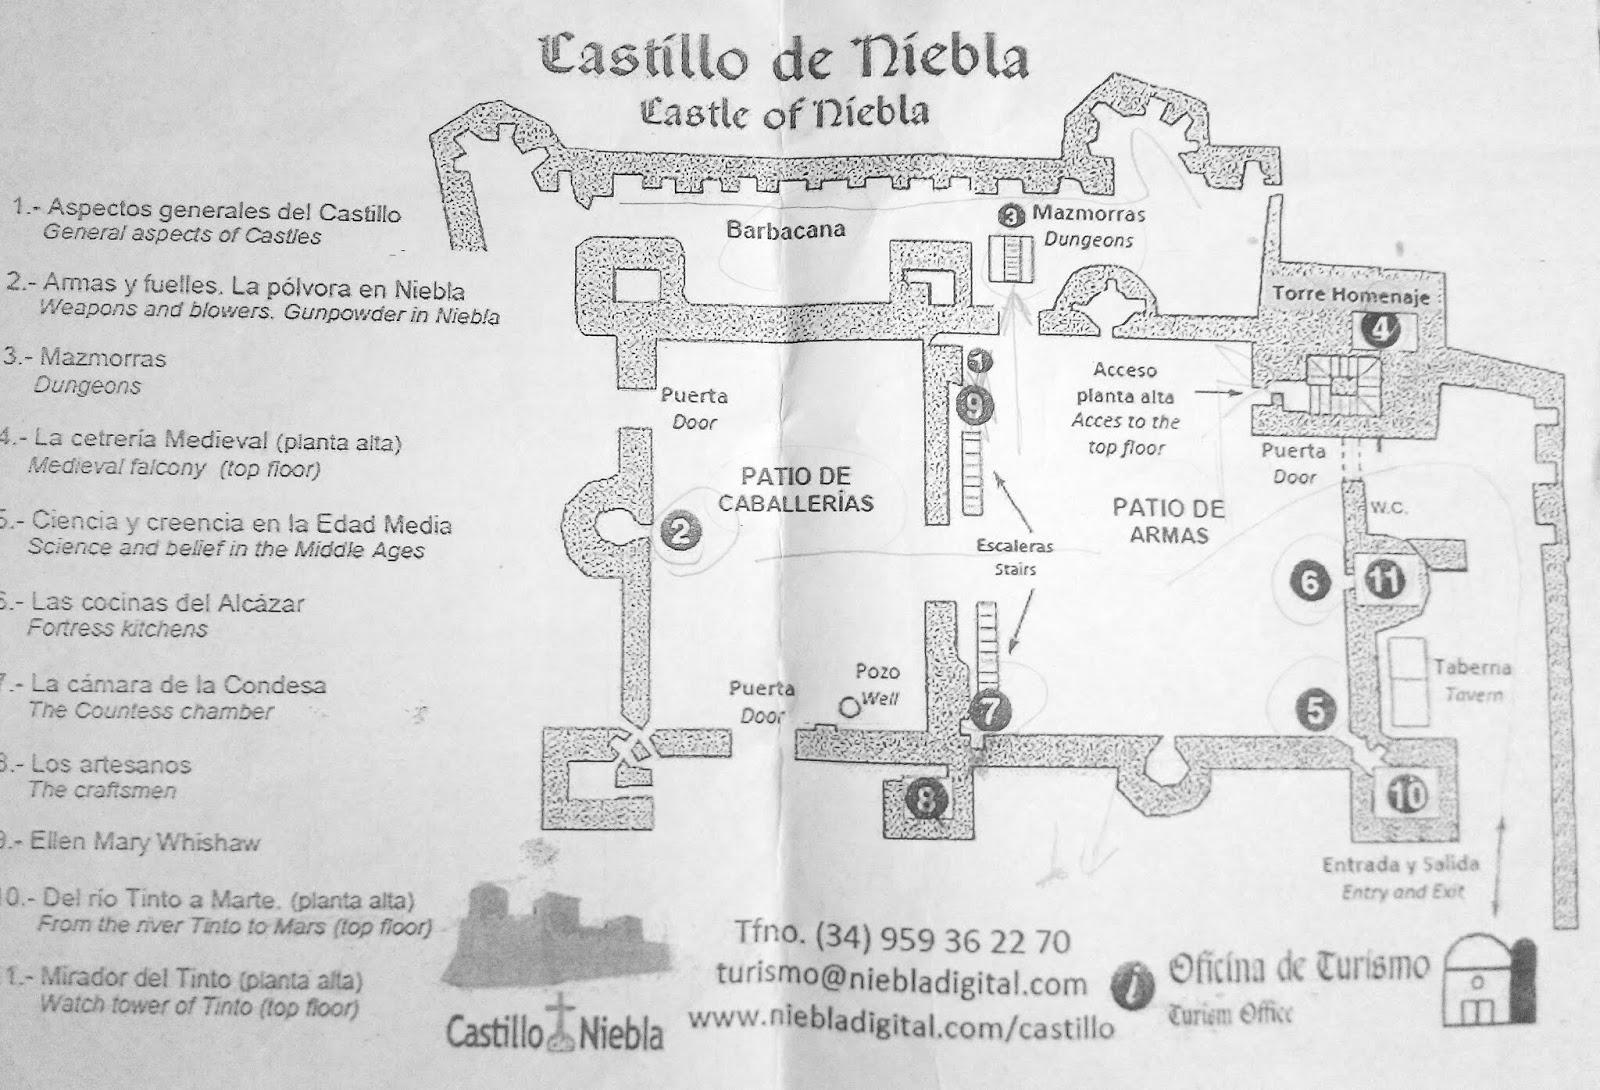 Plano Castillo de Niebla